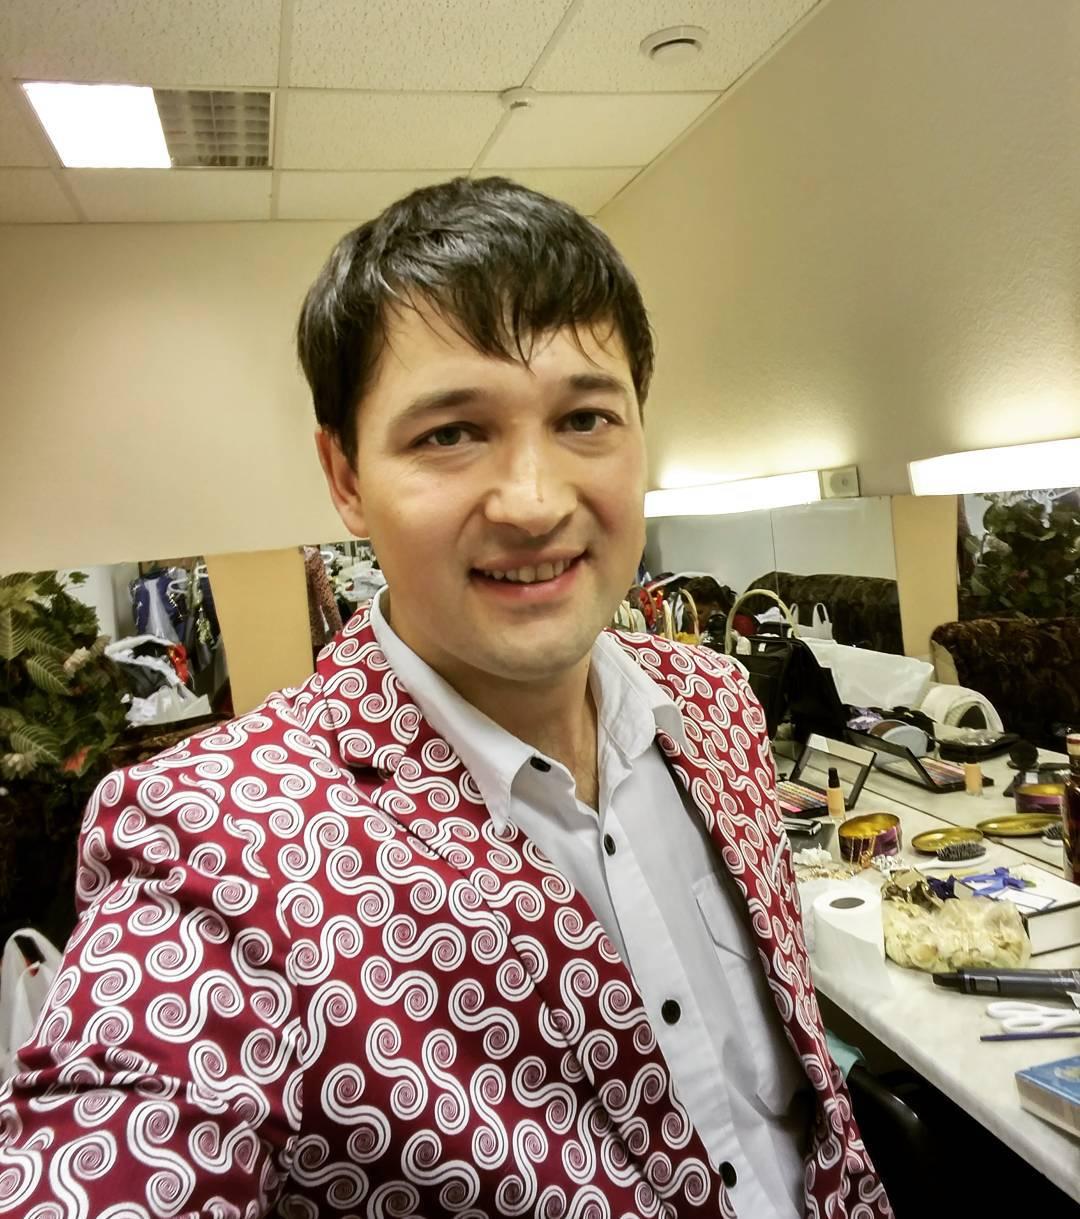 биография ильдара хакимова